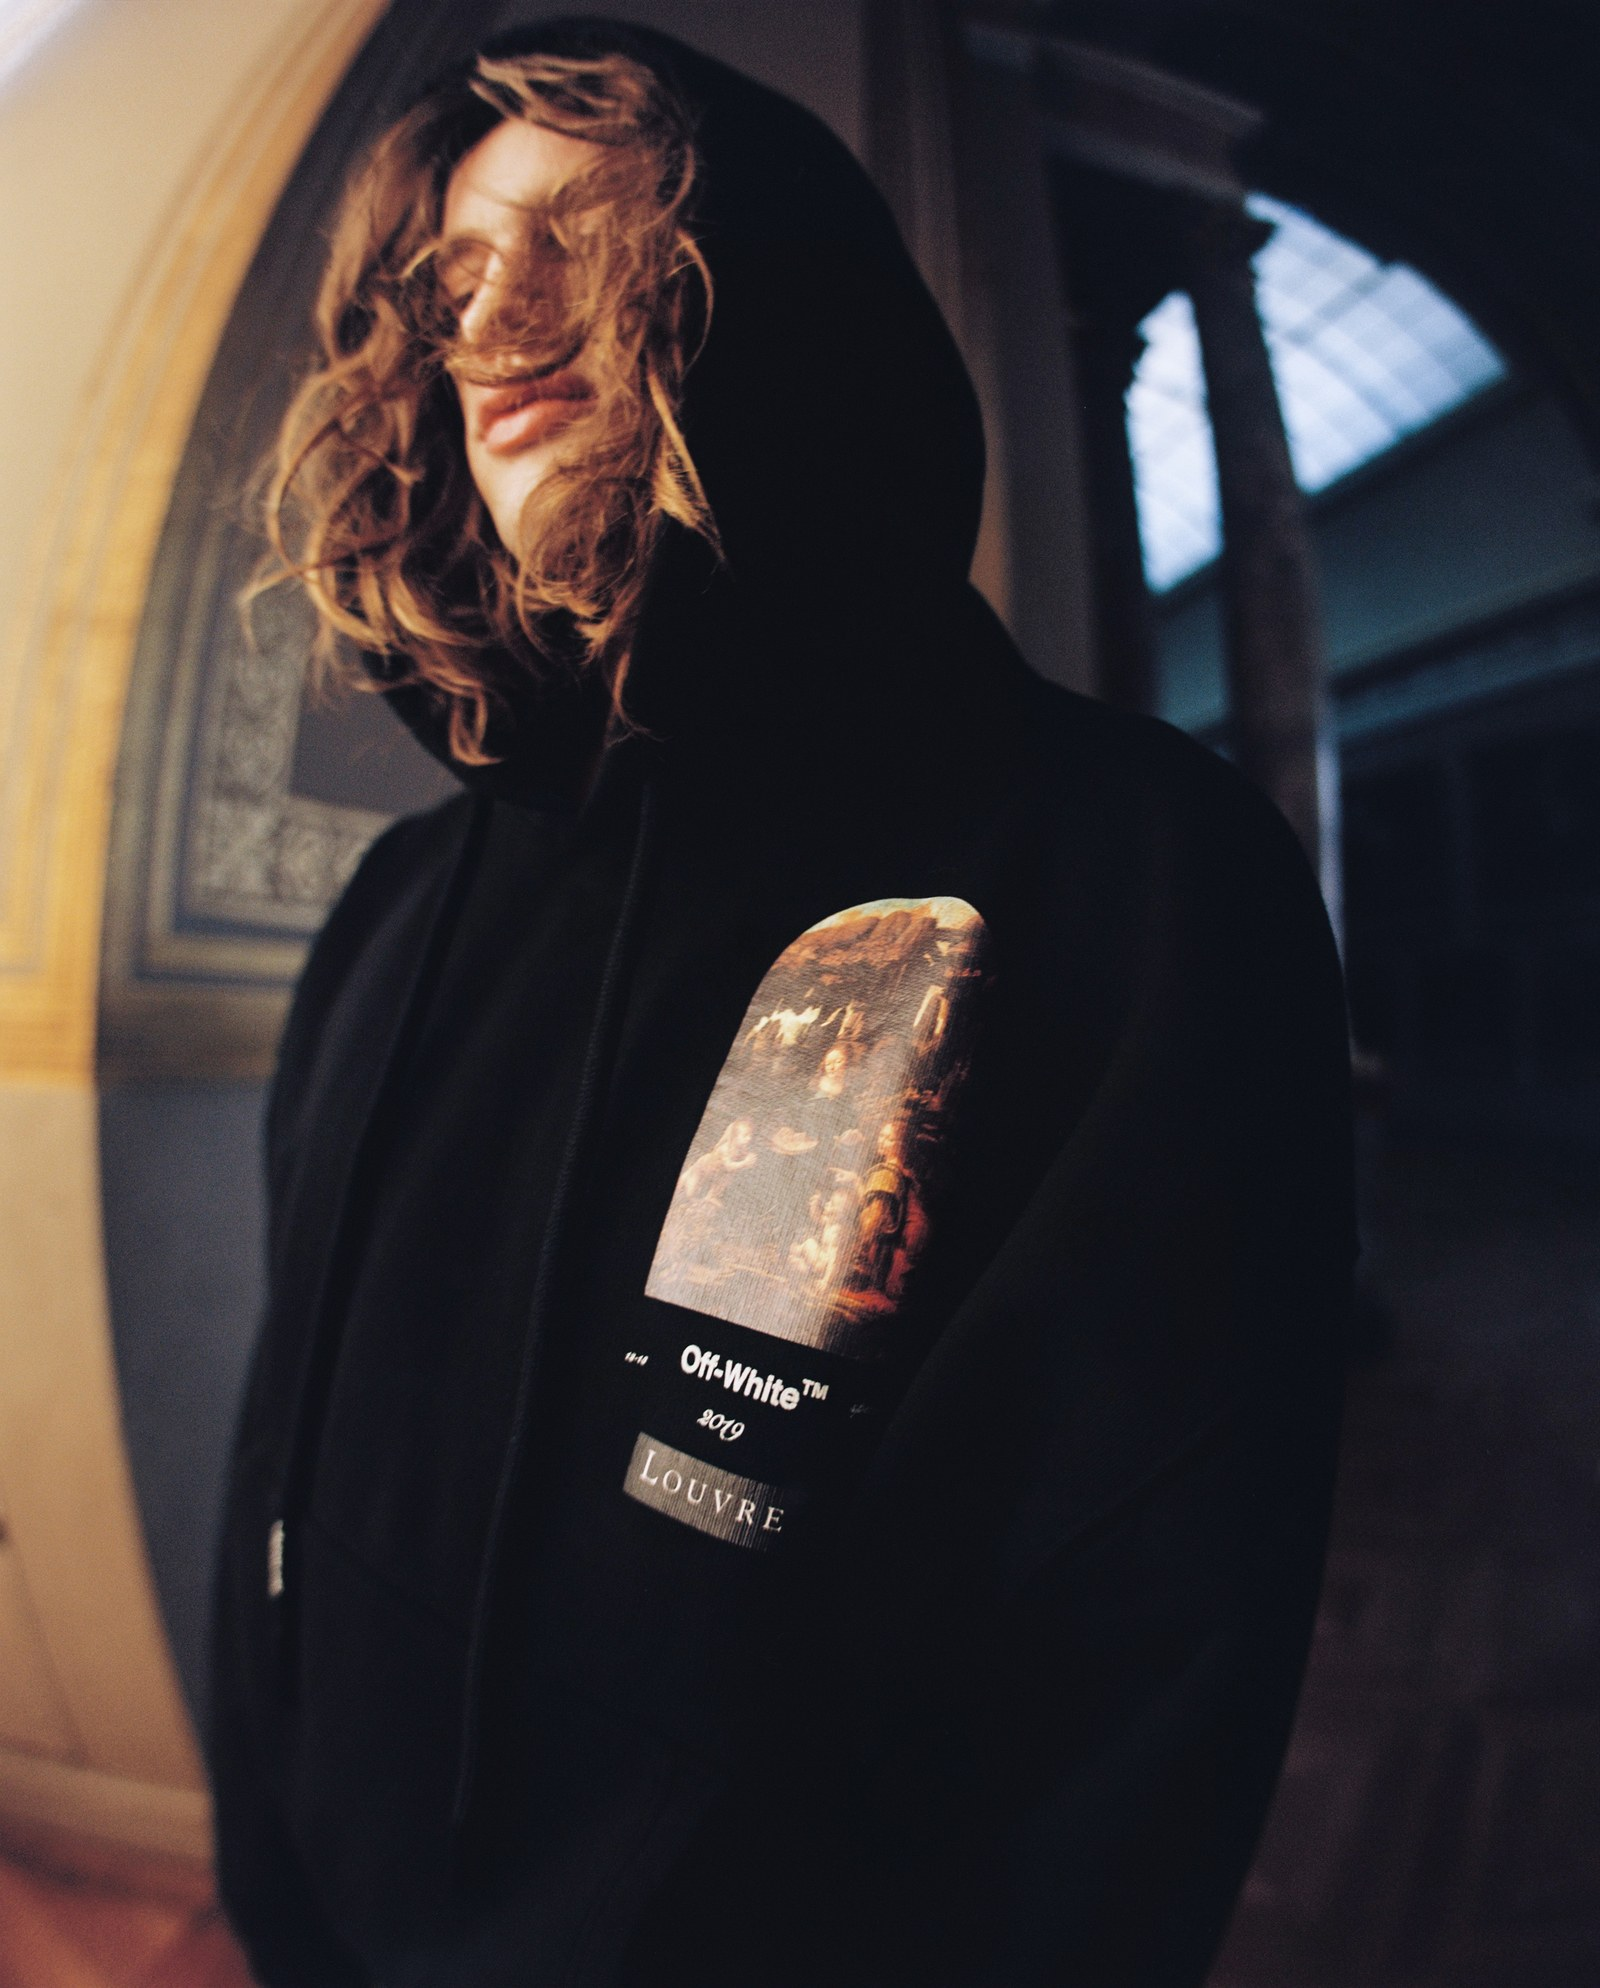 Thiết kế hoodie trong BST Off-White x Lourve - tin thời trang